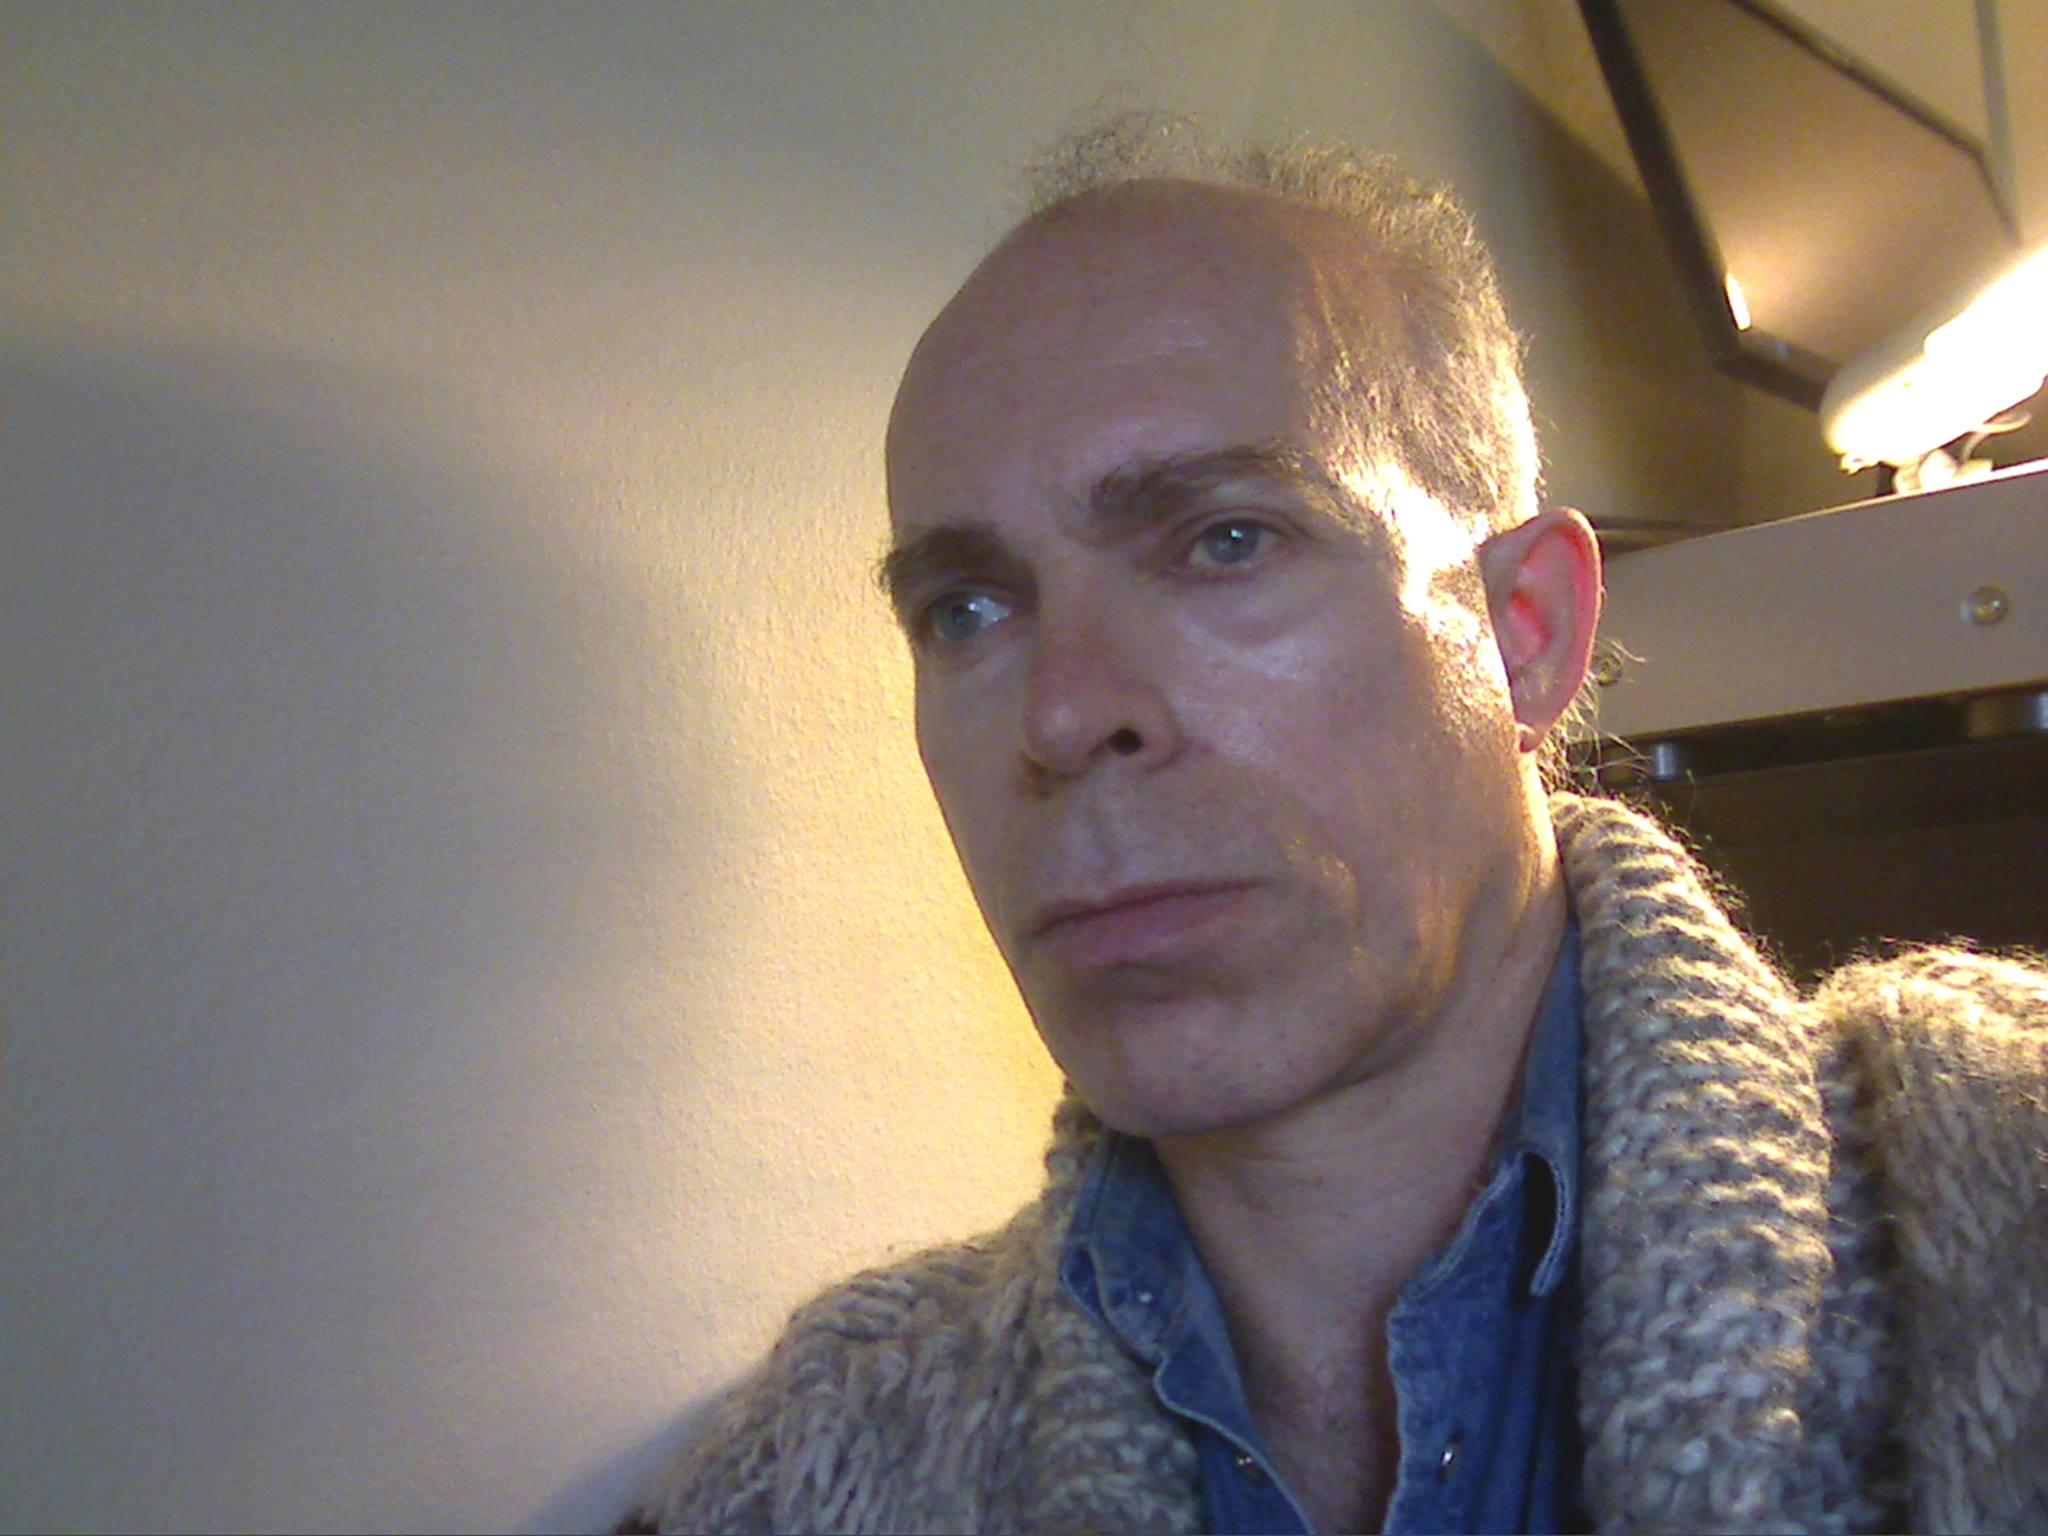 Ole Johan Grimsgaard-Ofstad, Ole Johan Grimsgaard-Ofstad ISIS, Norwegian prisoner isis, Ole Johan Grimsgaard-Ofstad norwegian isis, isis prisoner